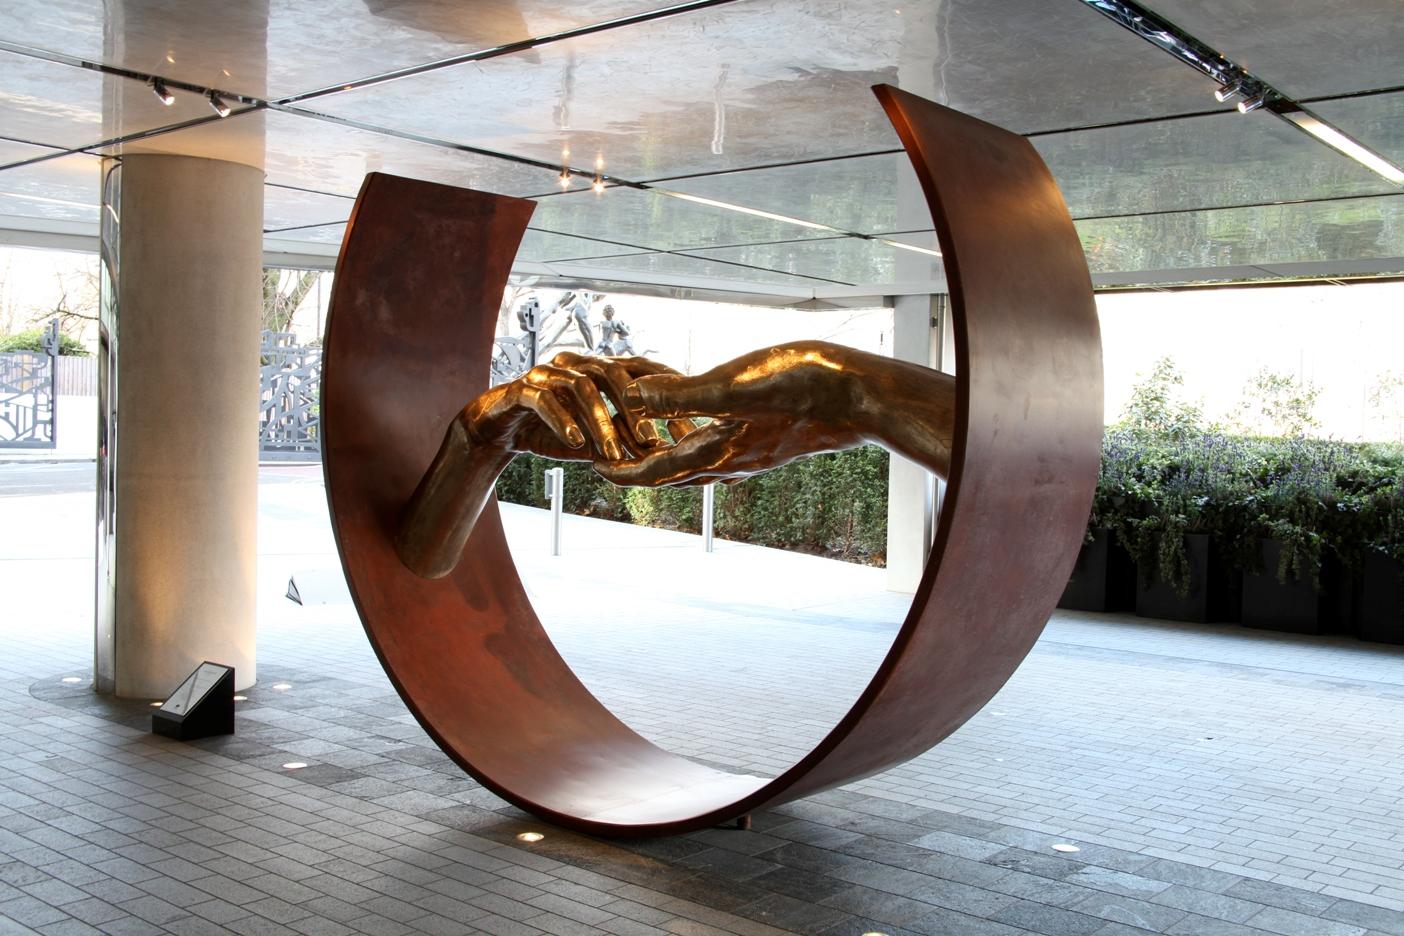 Sculpture Finding Love - bronce